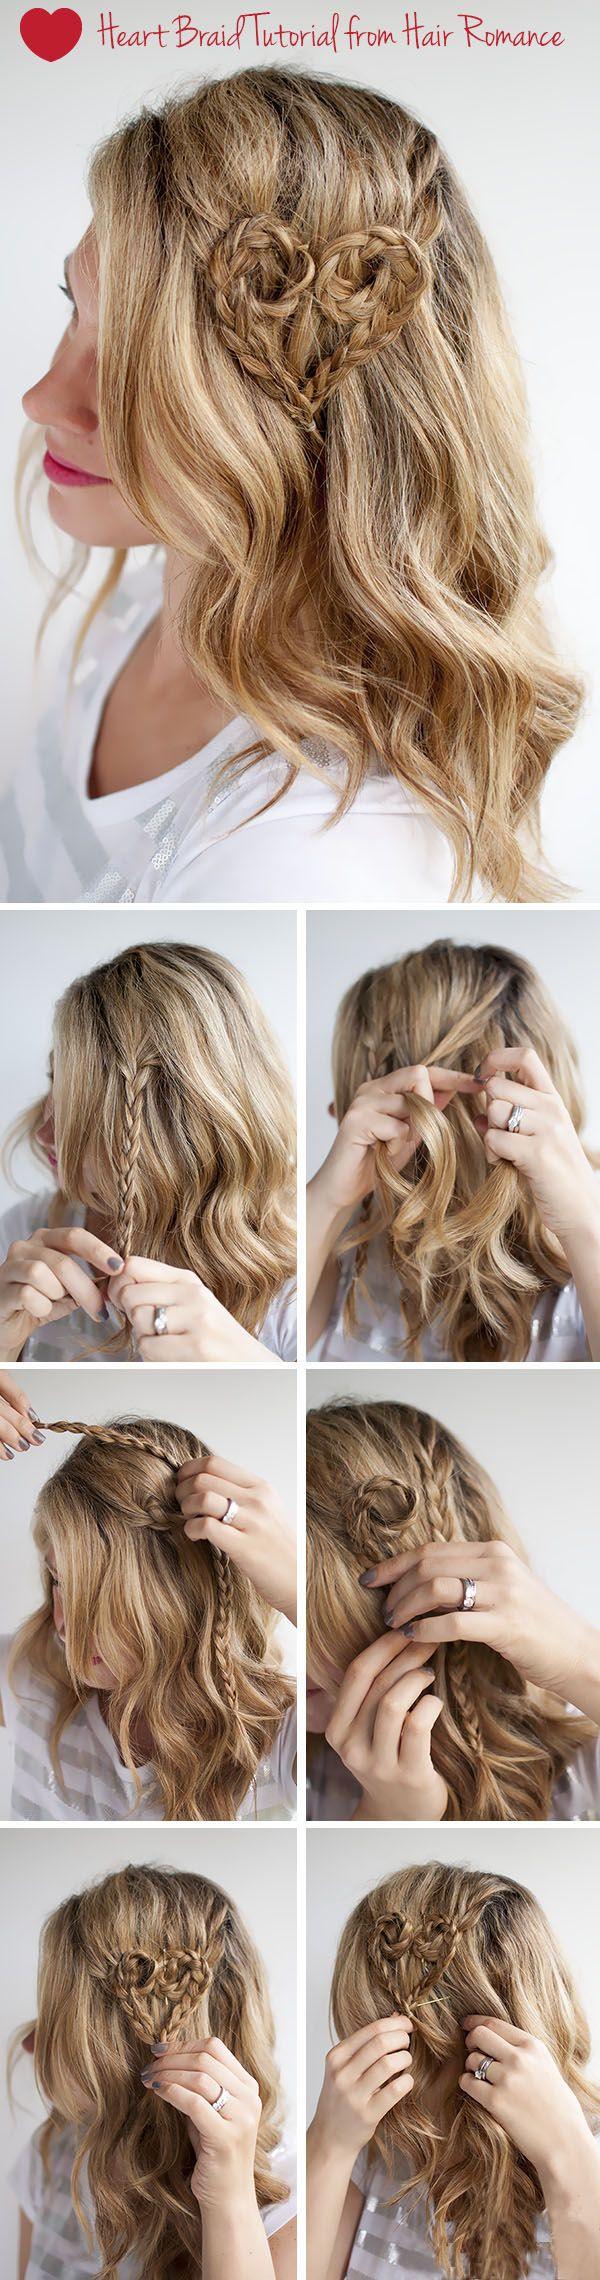 Hairstyle tutorial u heart braid hairstyle elfsacks peinados